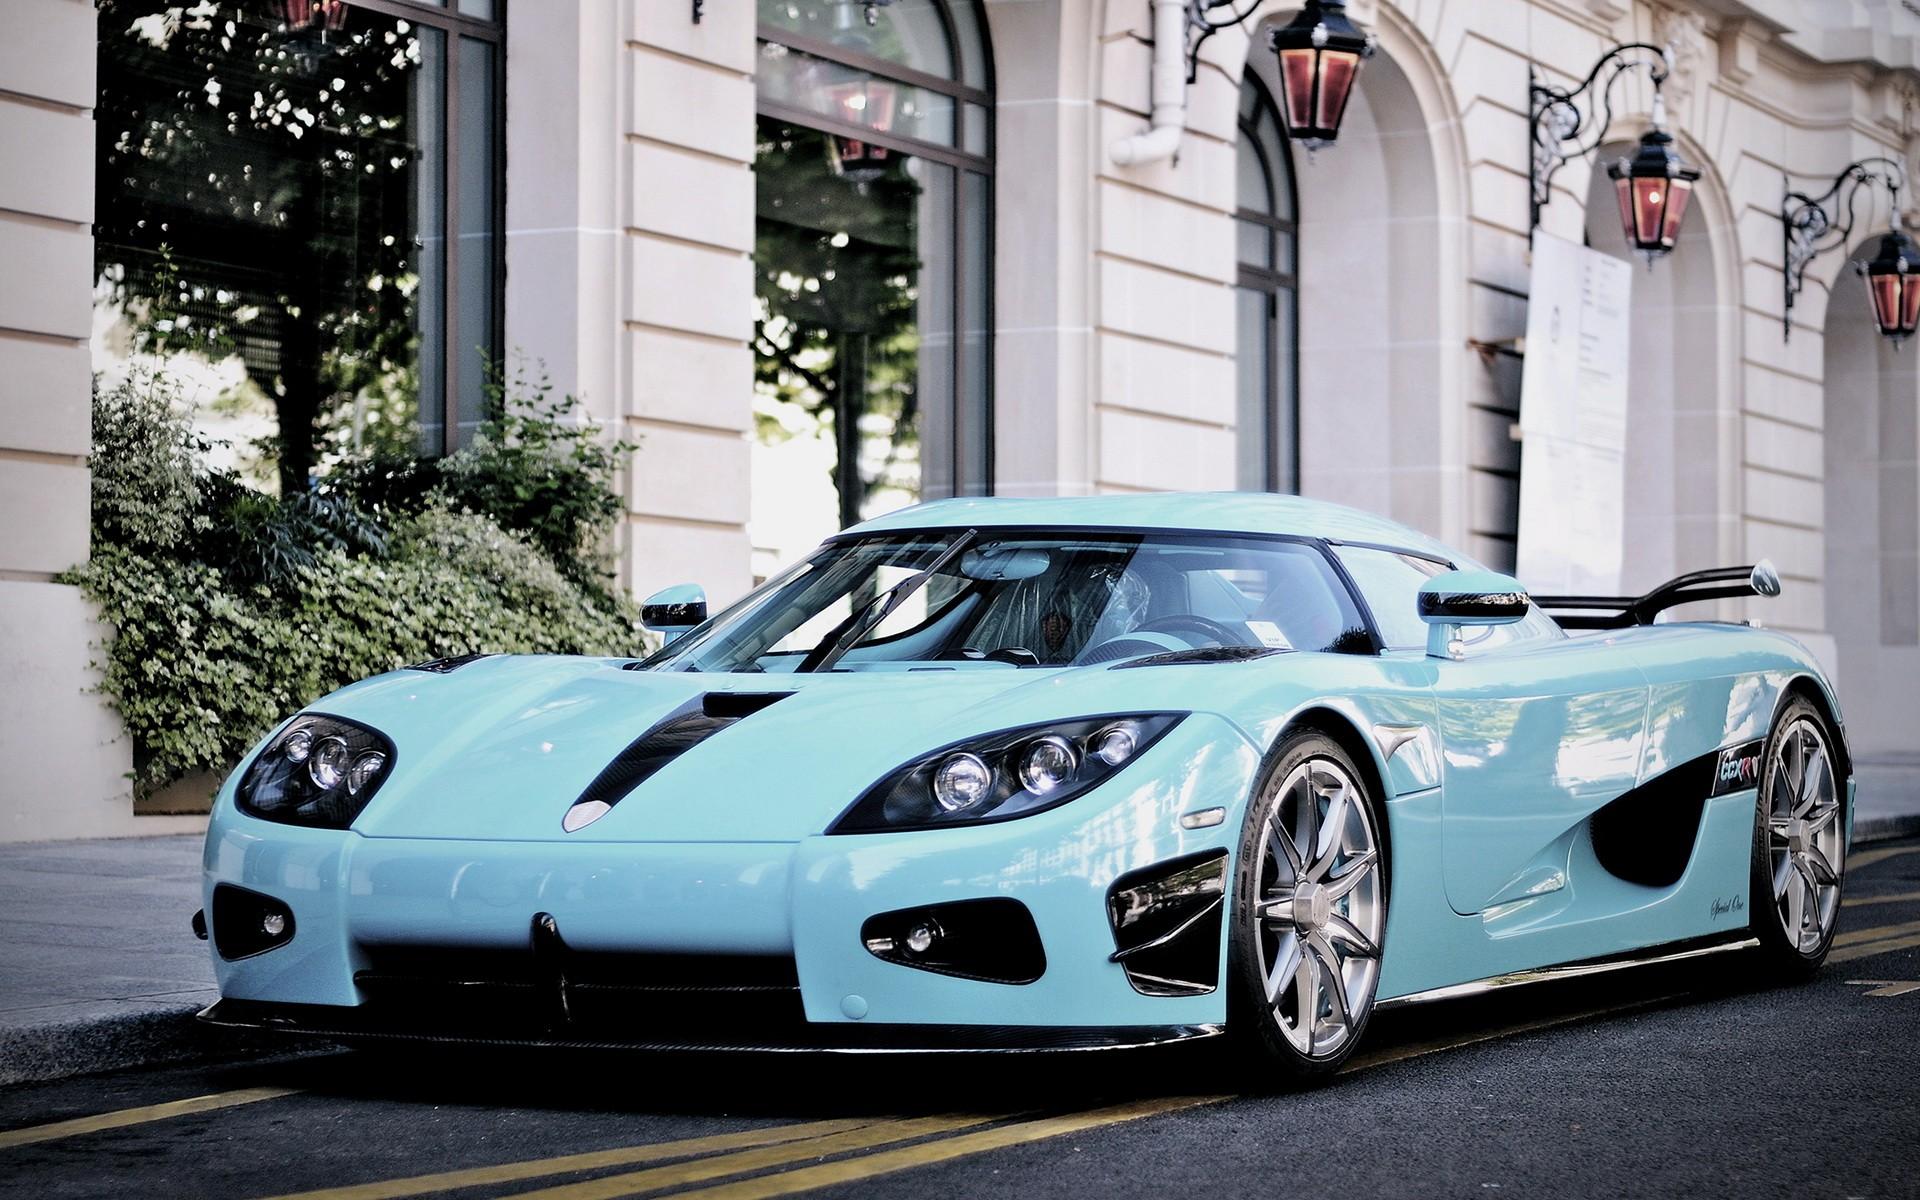 Download Car Wallpapers, Widescreen, Modified Cars, - Light Blue Koenigsegg Agera R - HD Wallpaper